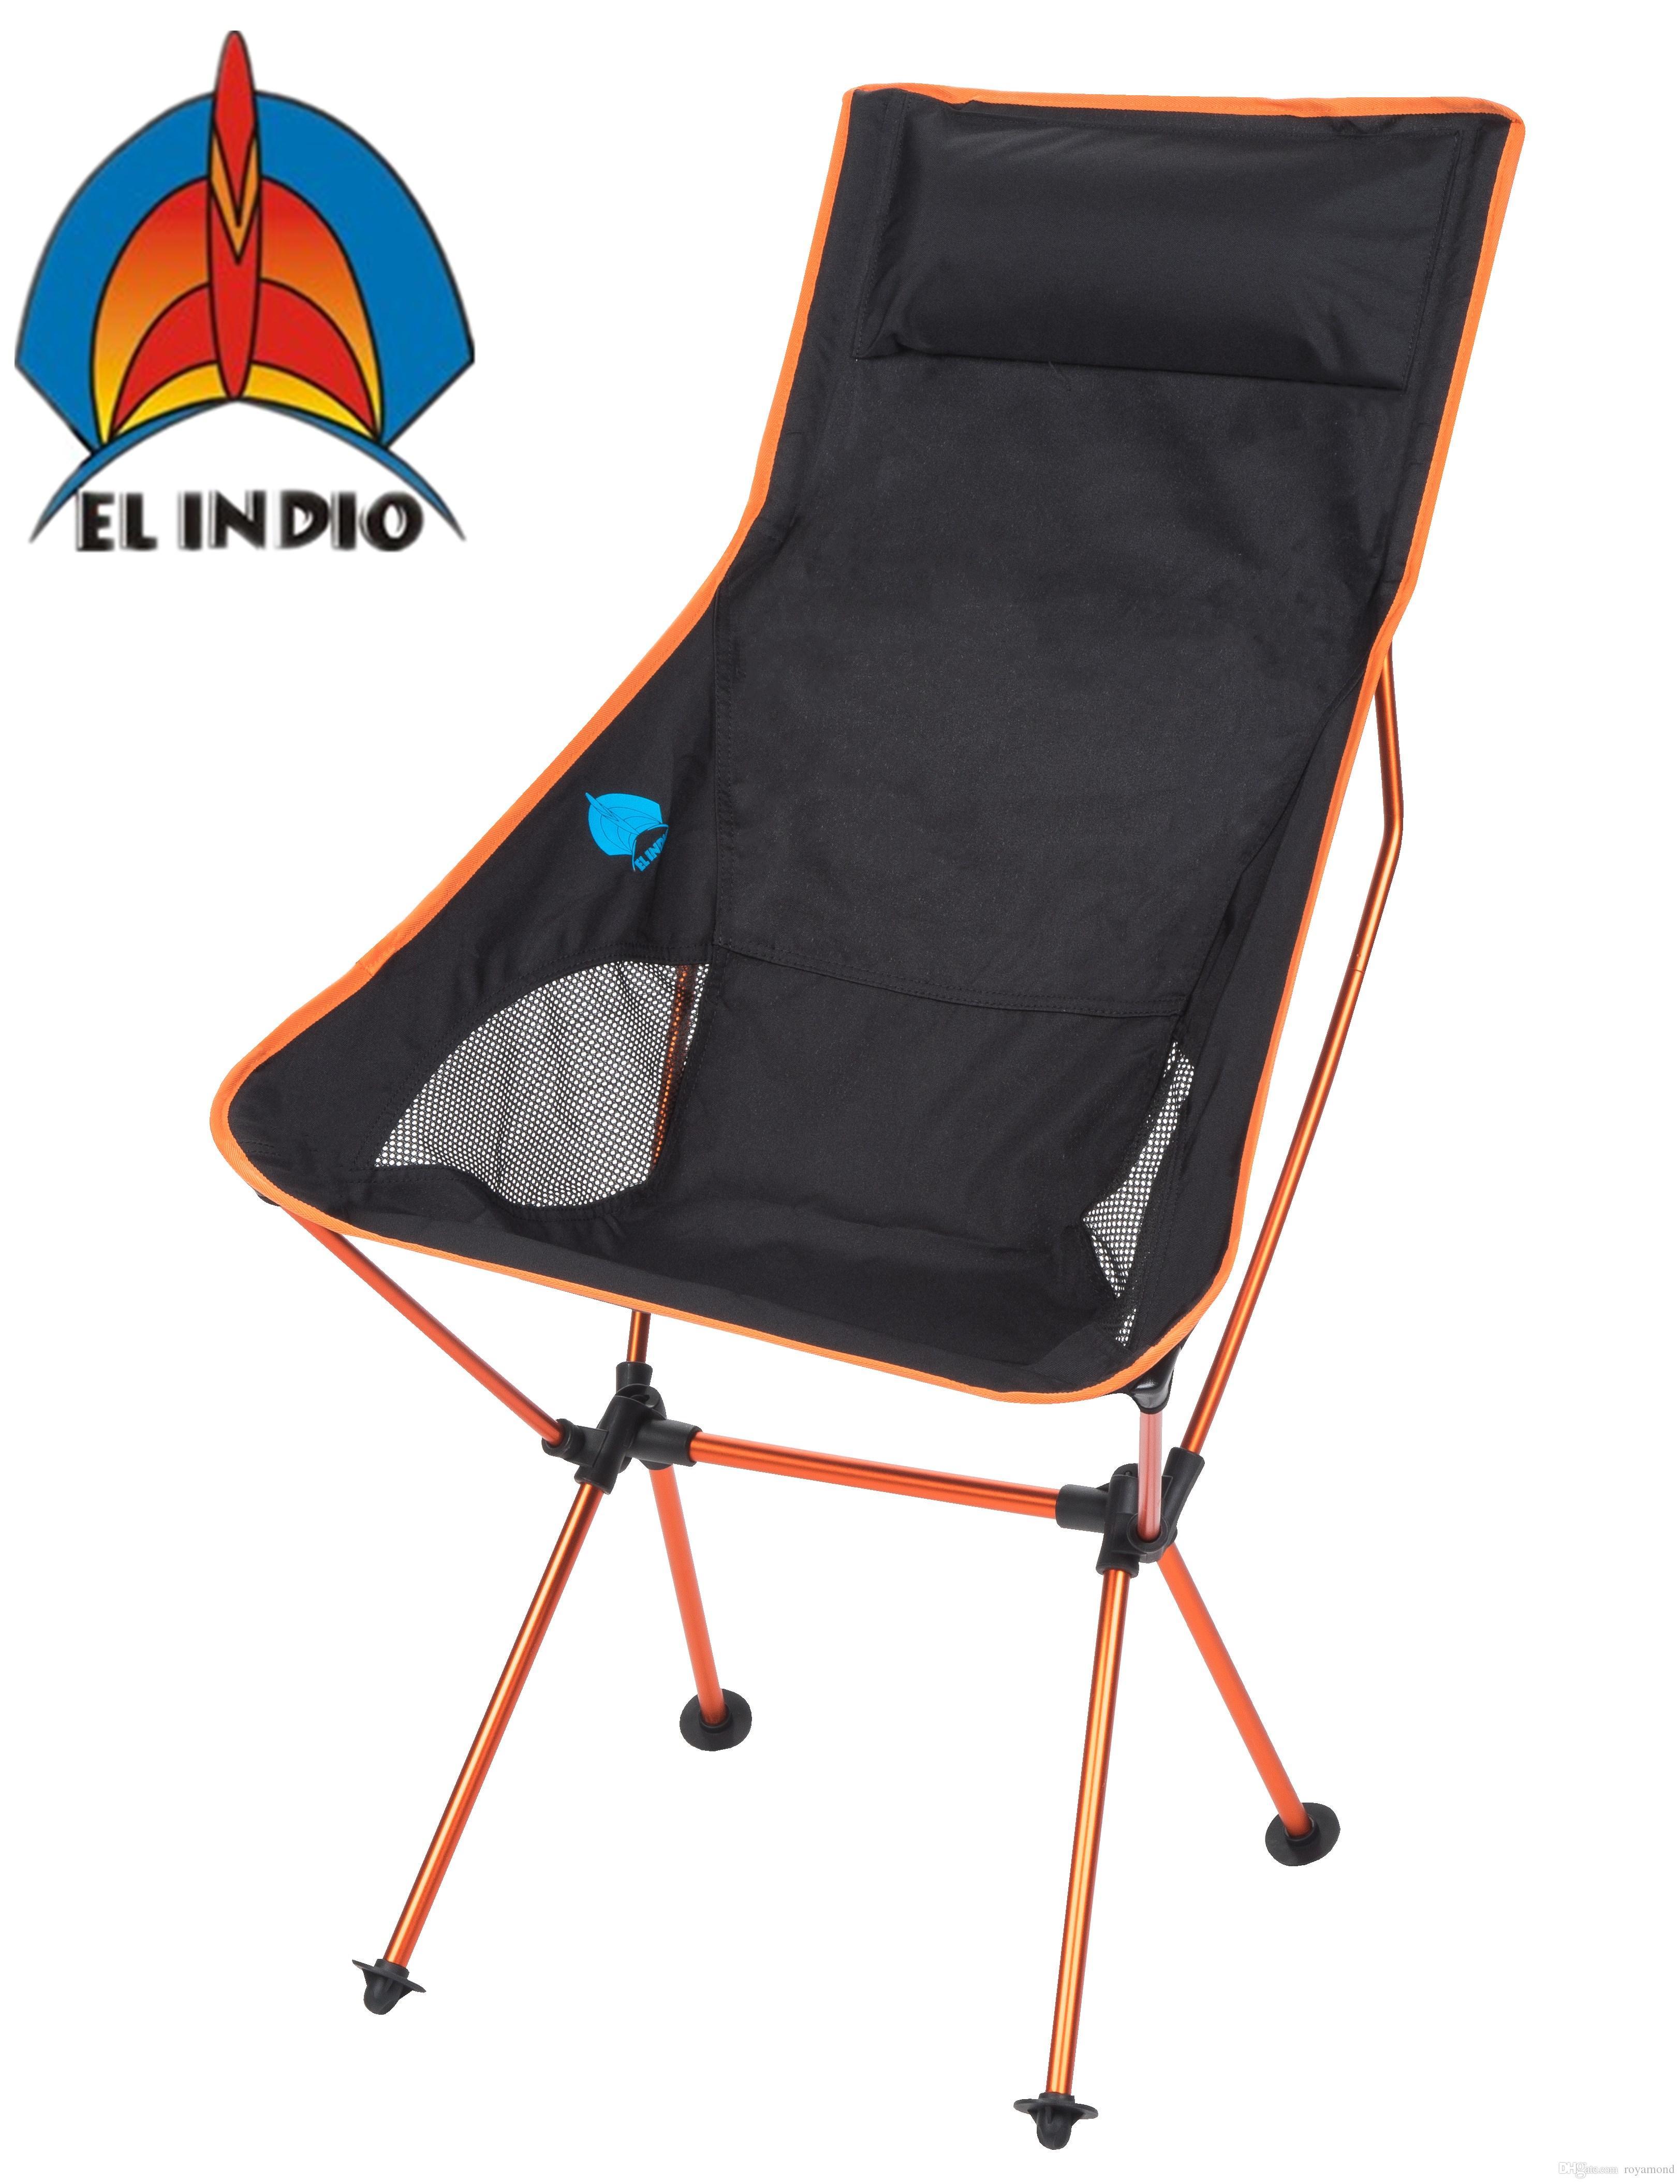 el indio fishing chair folding camping chairs ultra lightweight folding  portable OGLSJHF